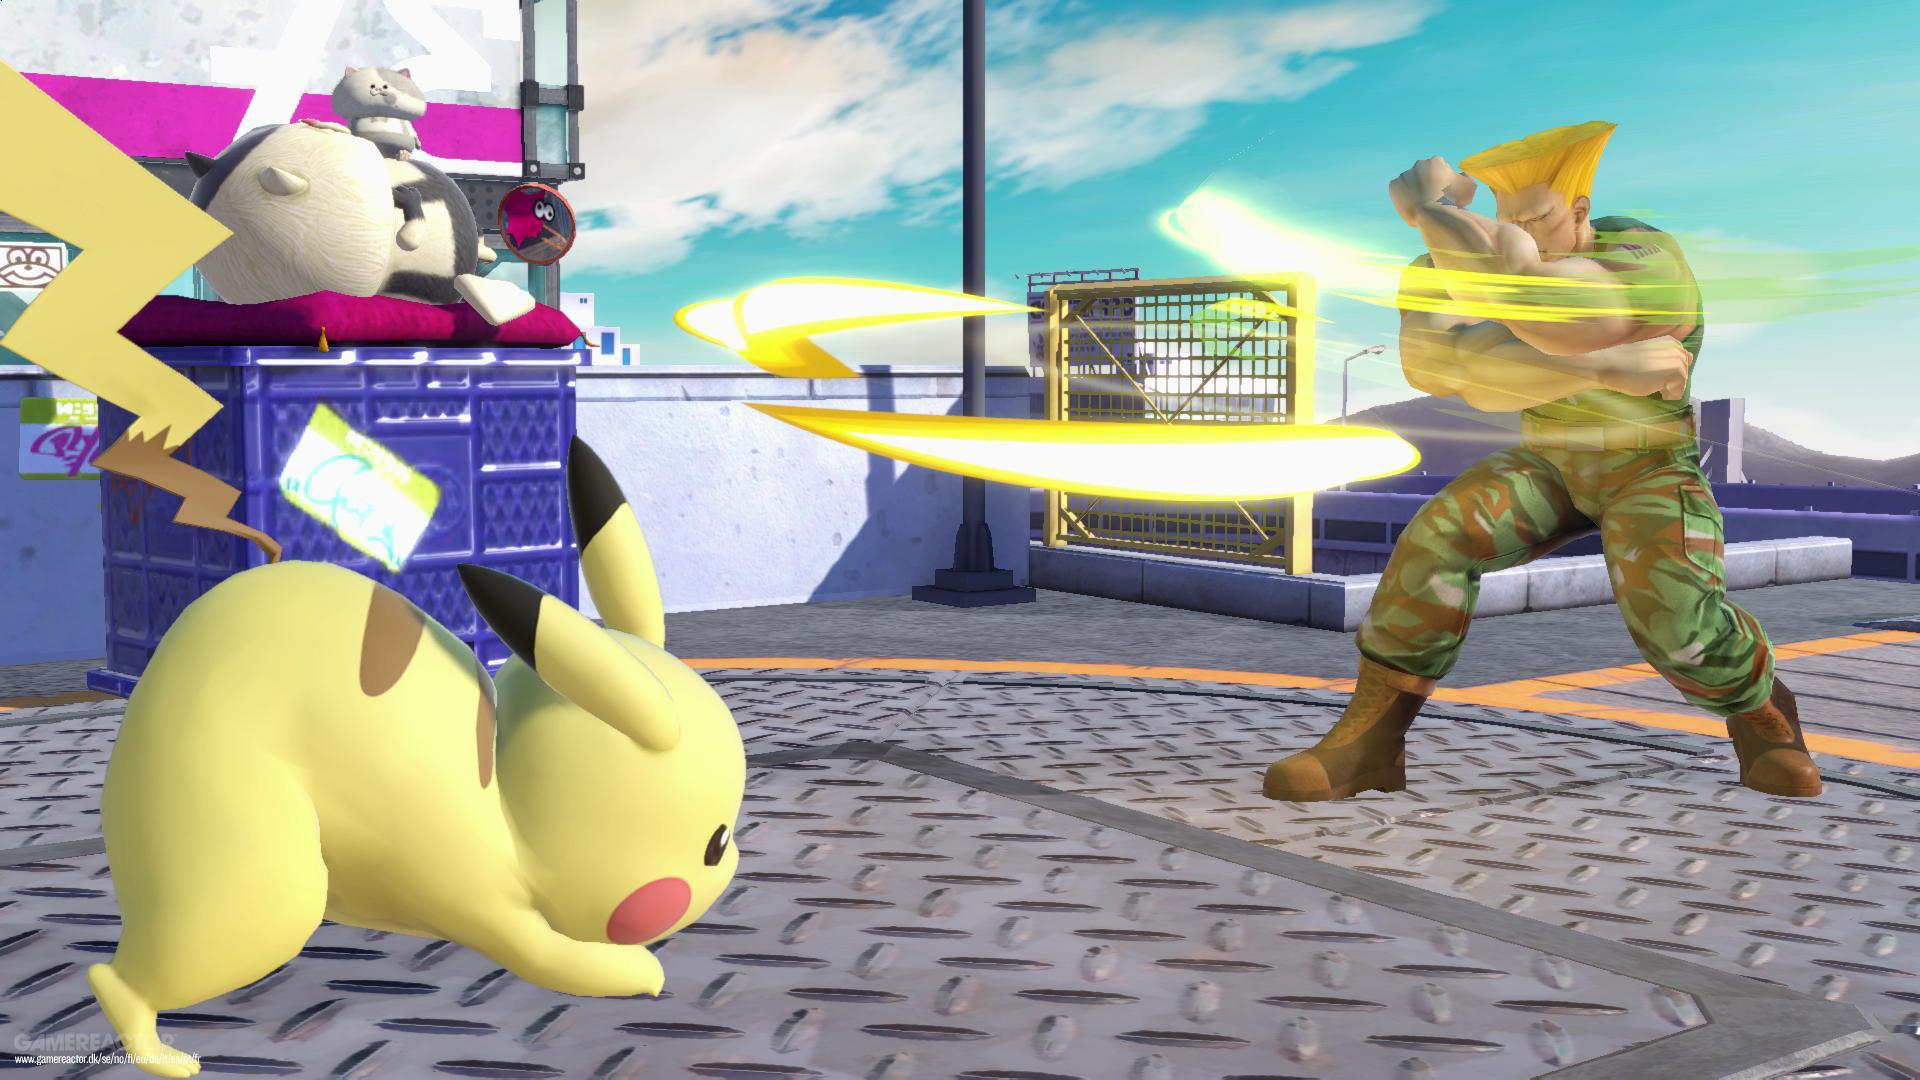 Super Smash Bros  Ultimate rules released for Genesis 6